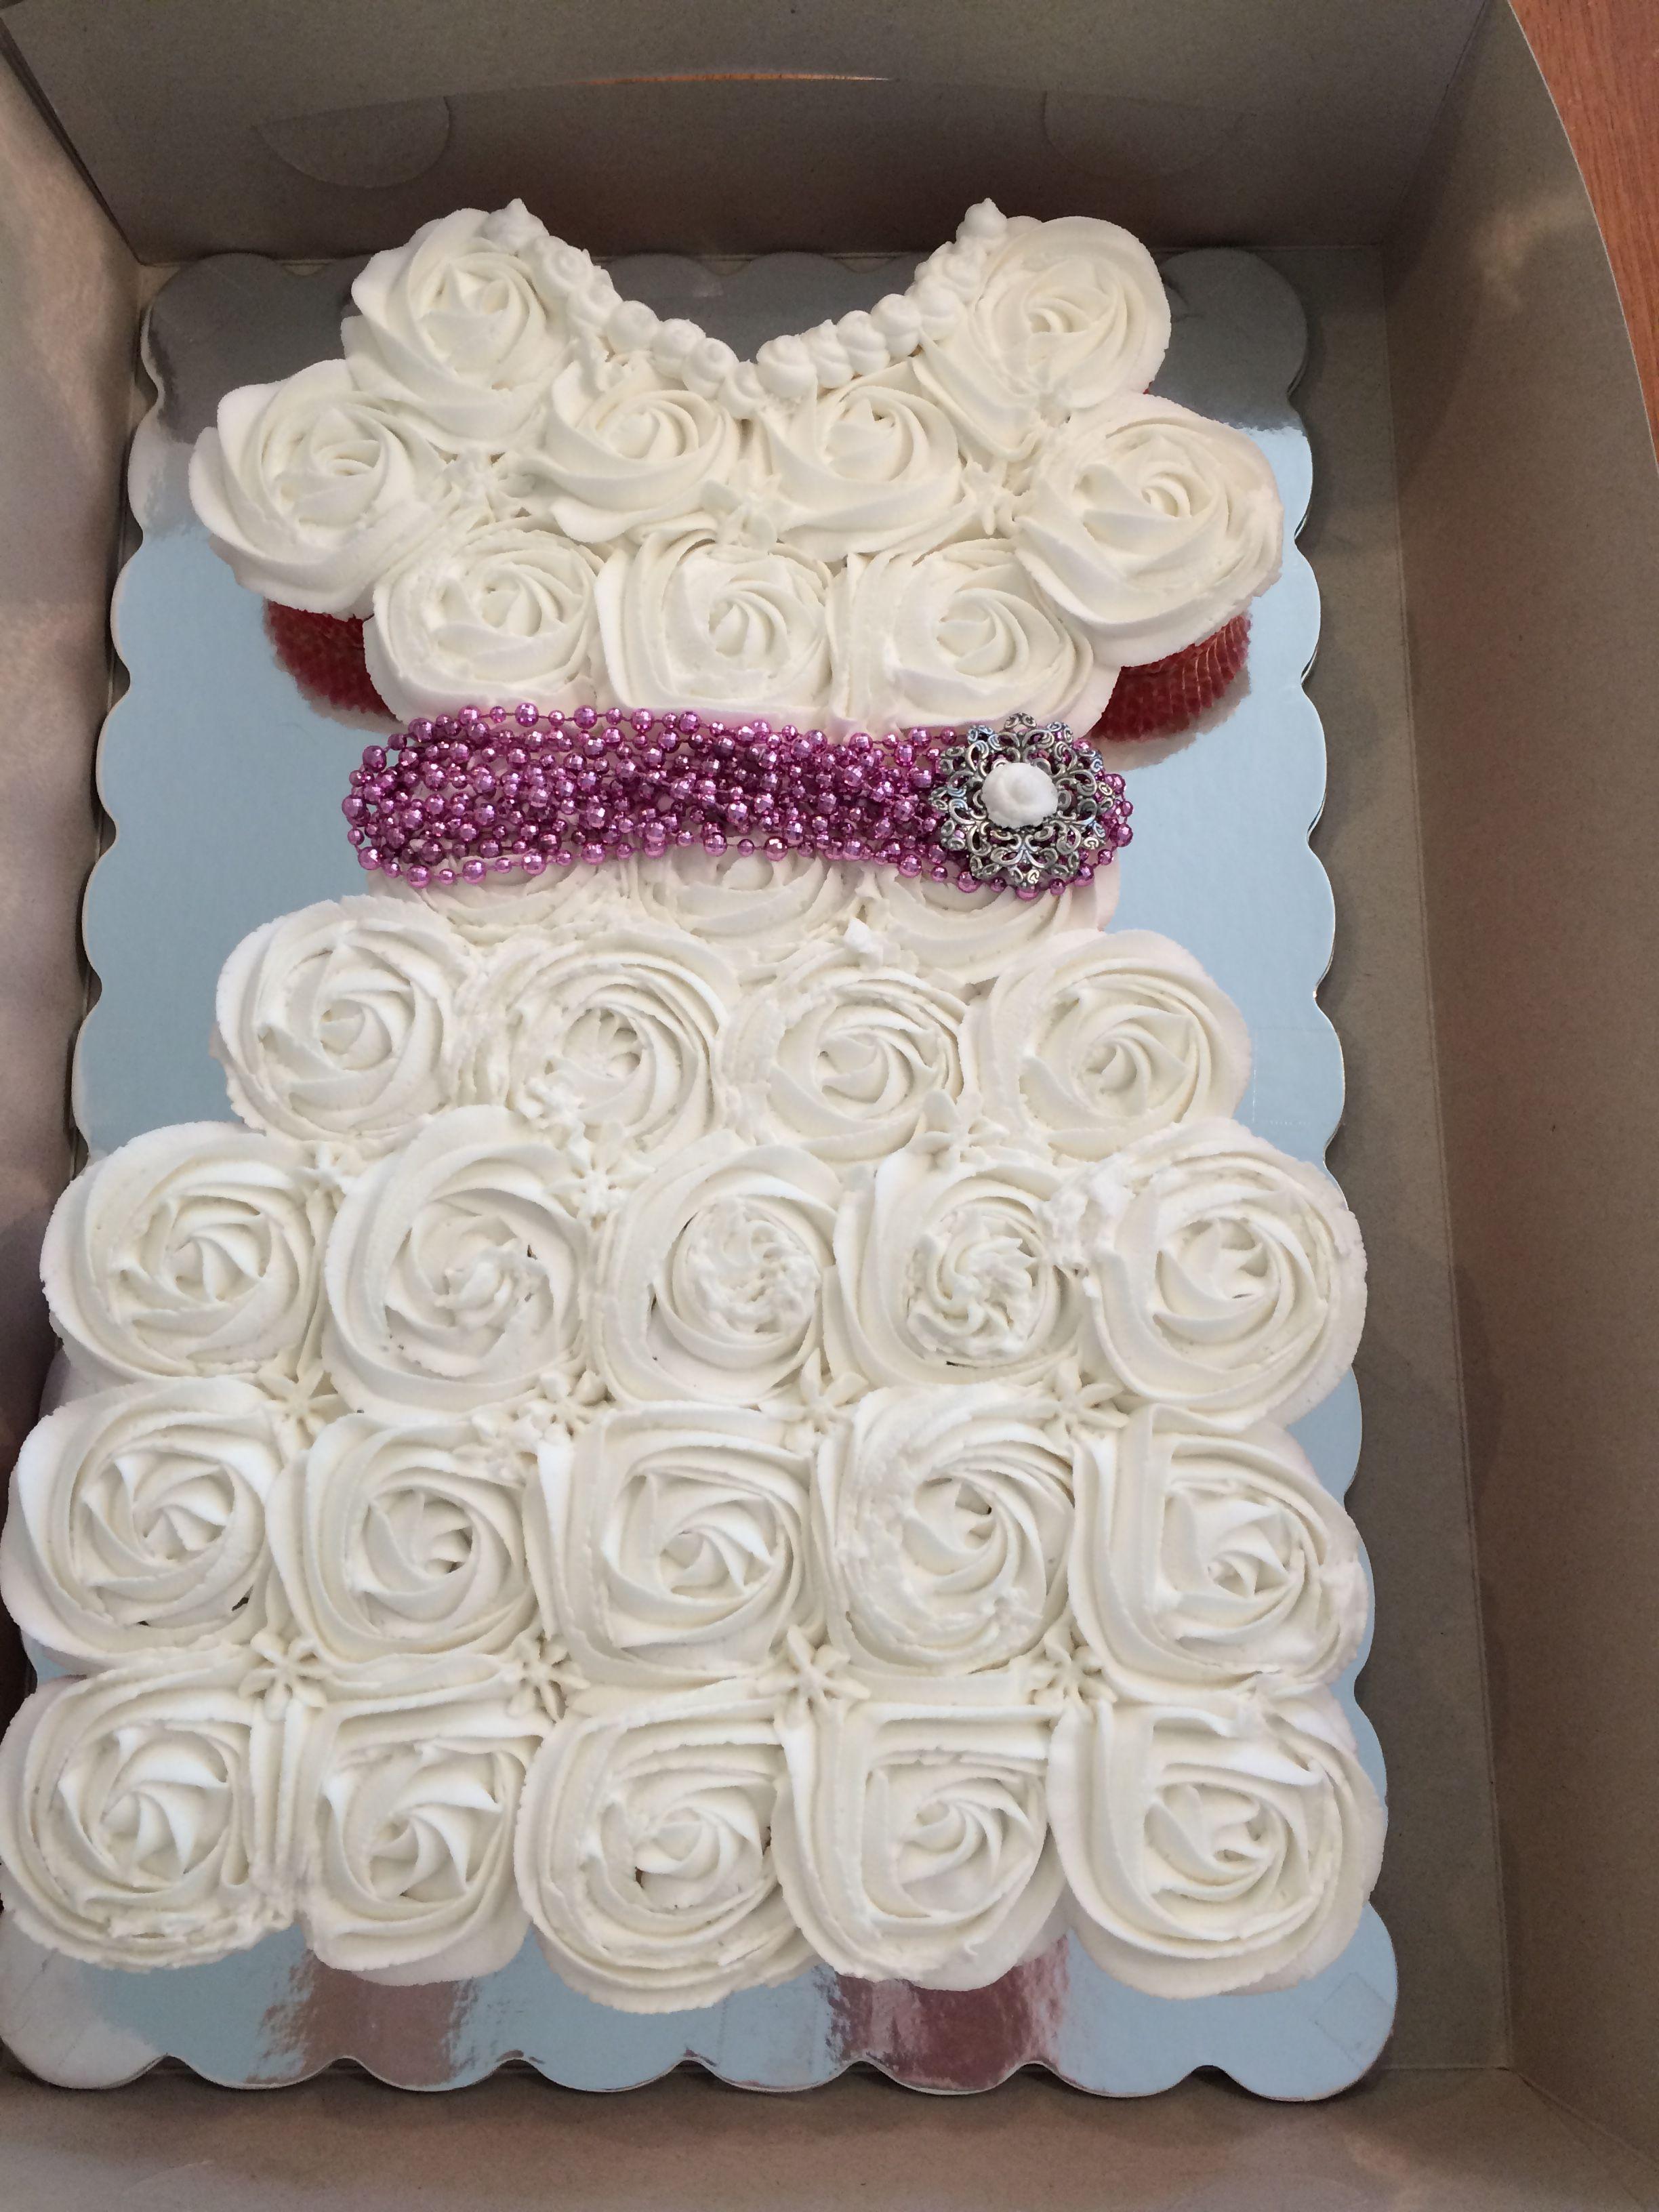 Walmart Bridal Shower Cakes : walmart, bridal, shower, cakes, Bridal, Shower, Cupcakes,, Simple, Walmart, Medallion, Hand., Si…, Cakes,